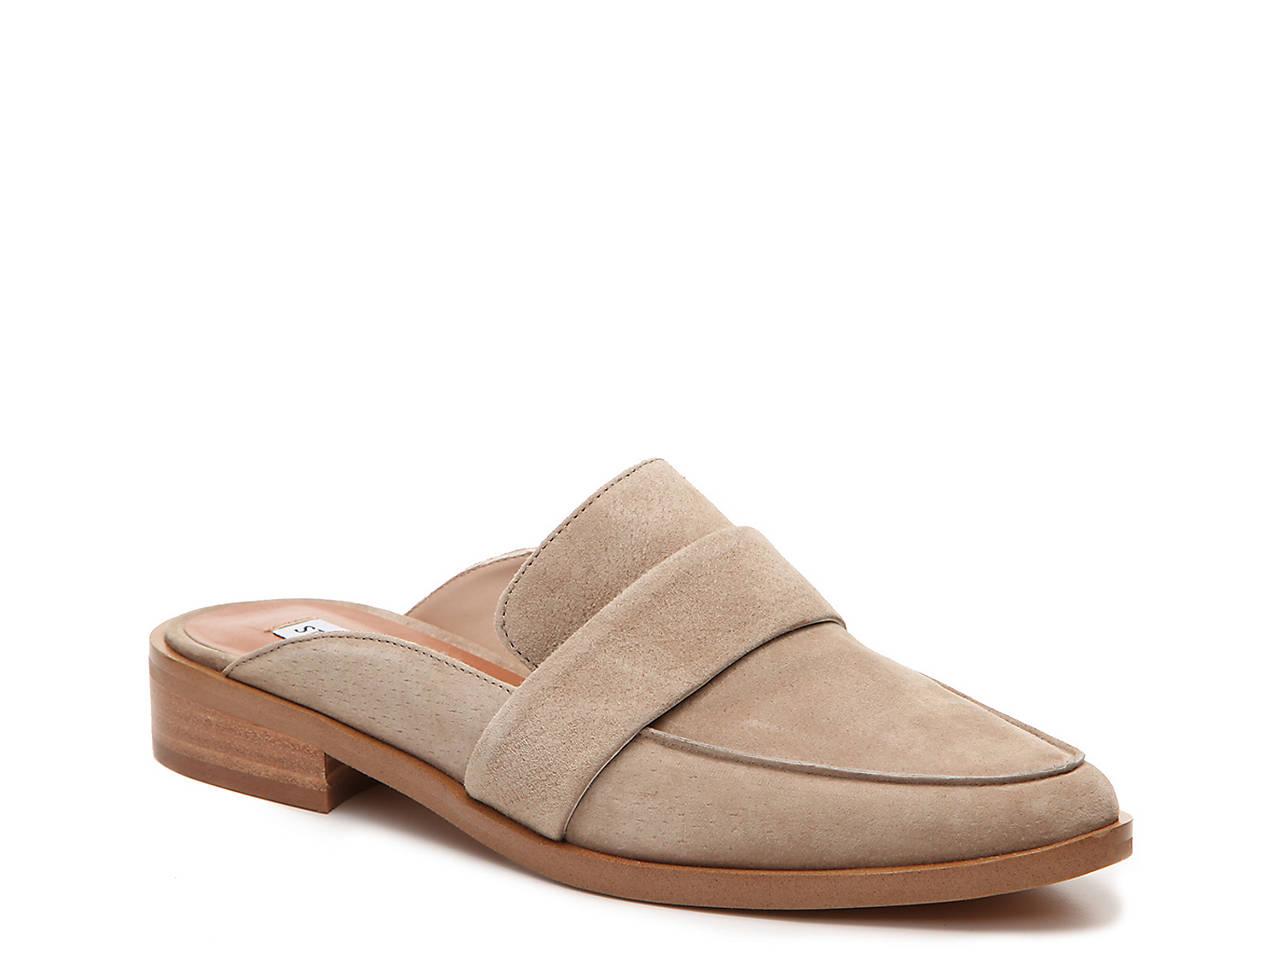 Chaussures - Mules Steve Madden nMTWcEG9